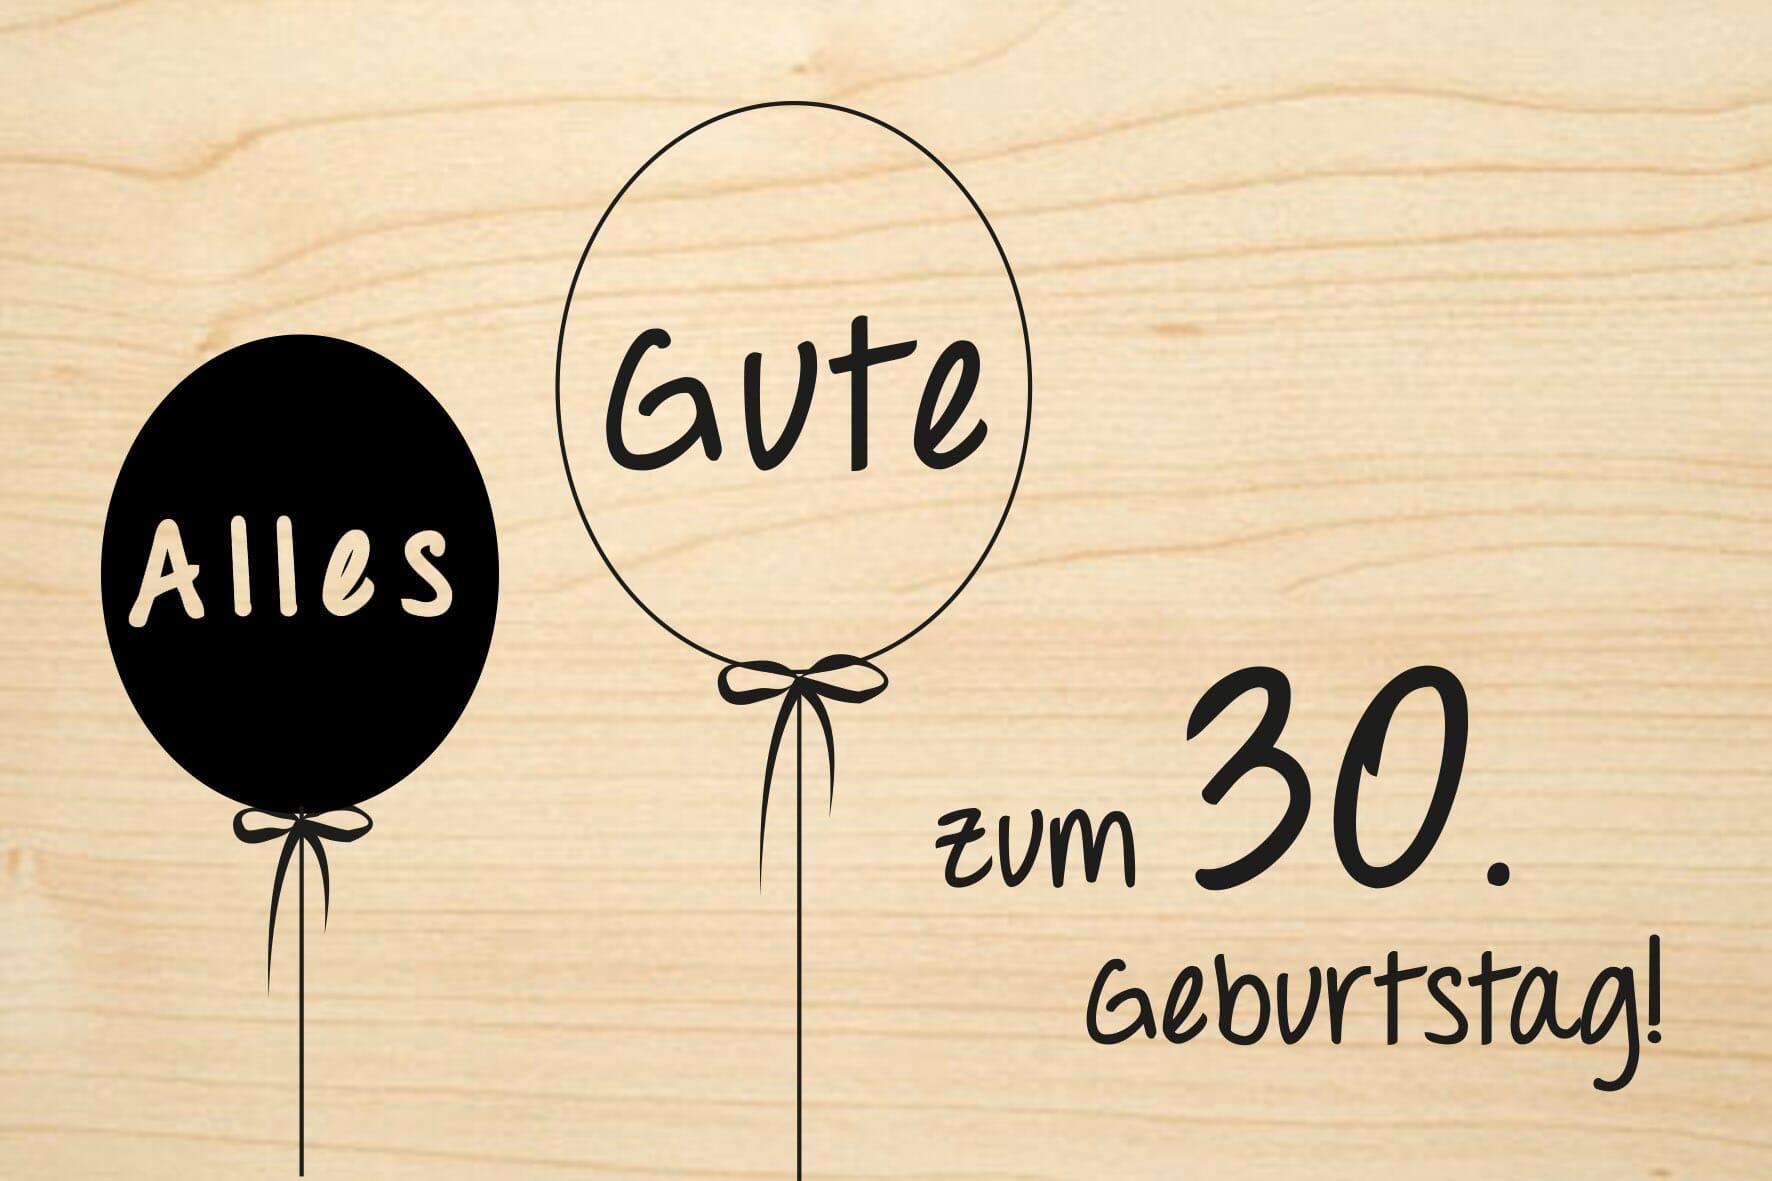 Holzgrusskarte: Alles Gute zum 30. Geburtstag - Ballon